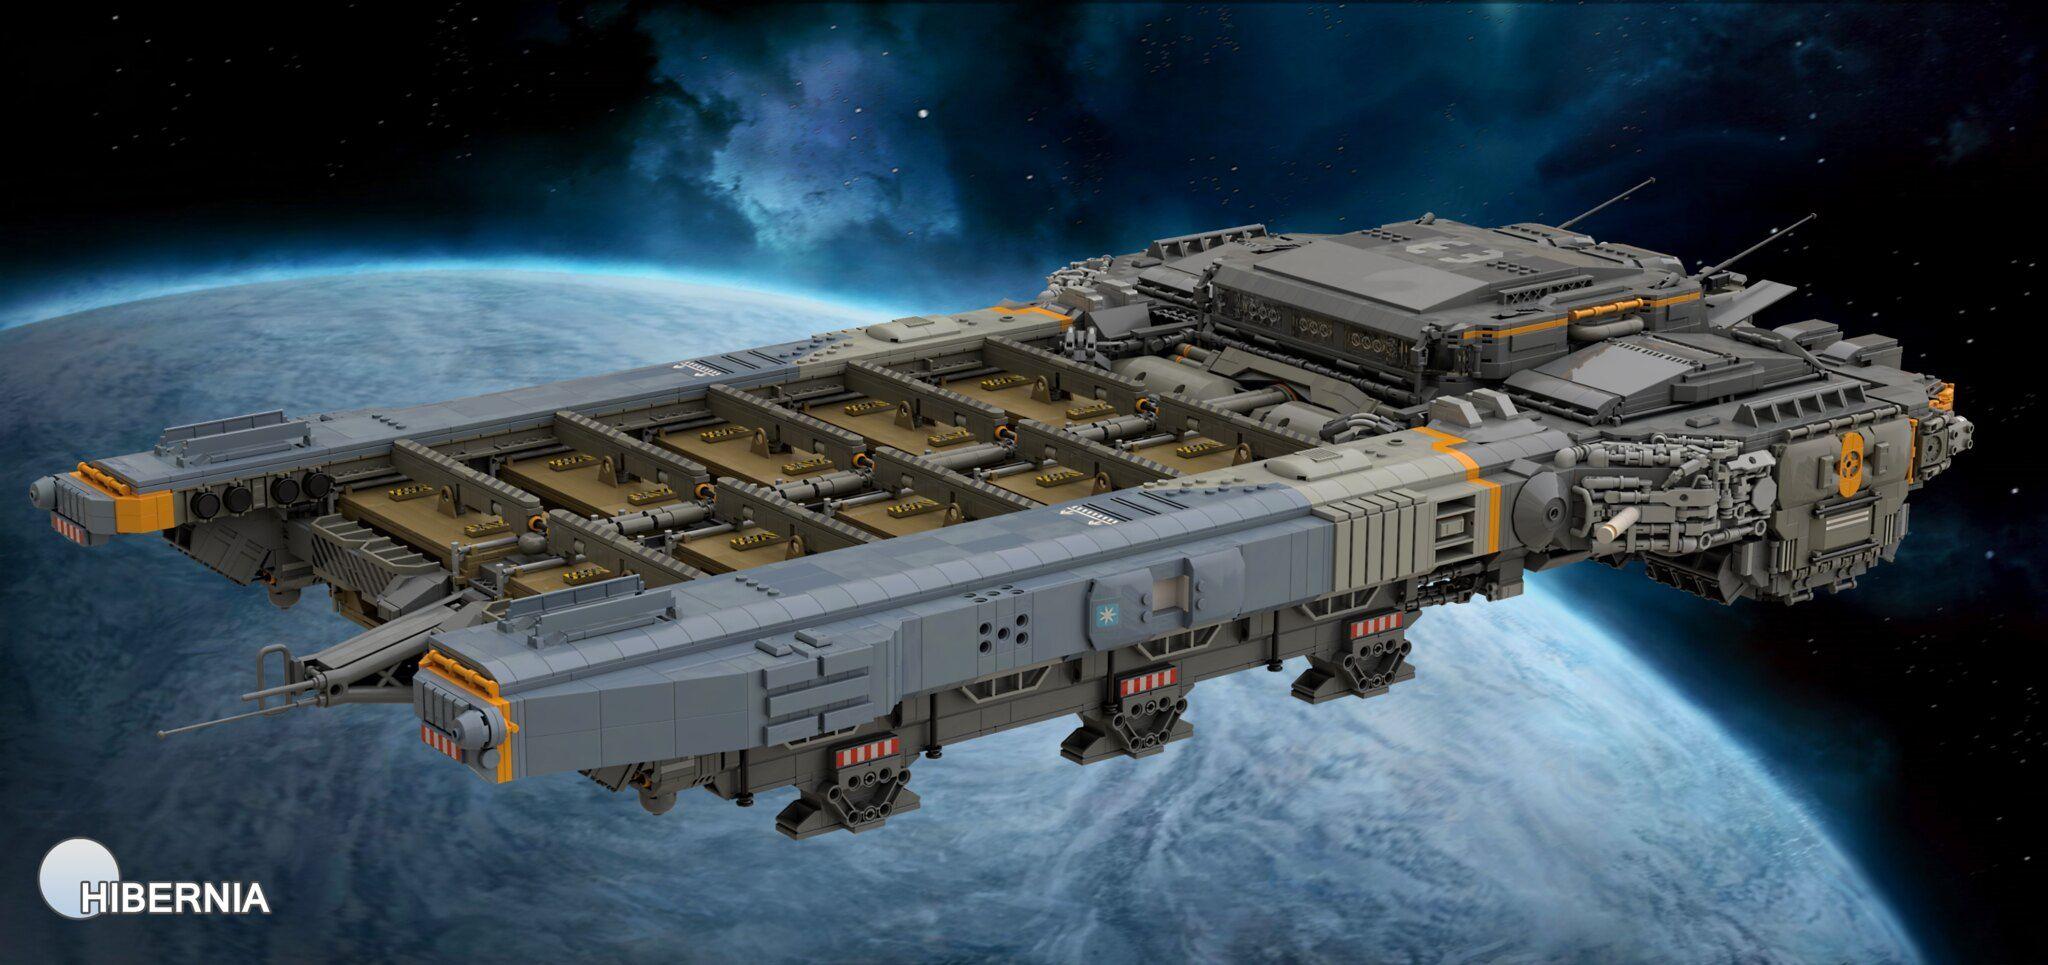 Medium Freighter Ship Sturgeon Starship Design Lego Ship Starship Concept